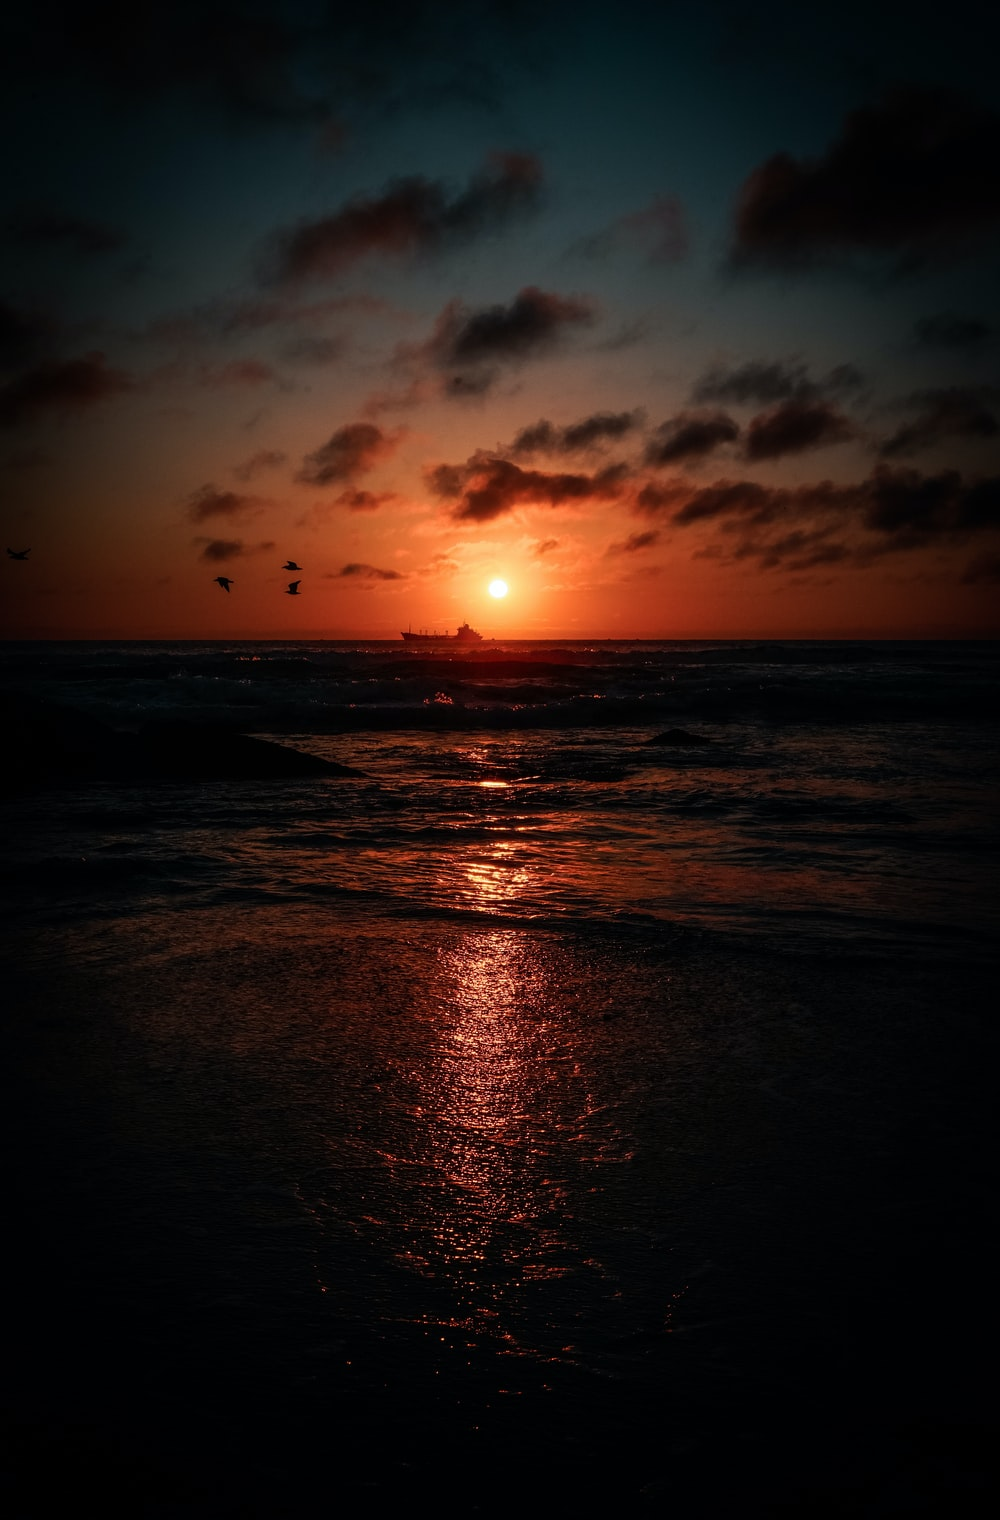 birds flying over wavy ocean during sunset